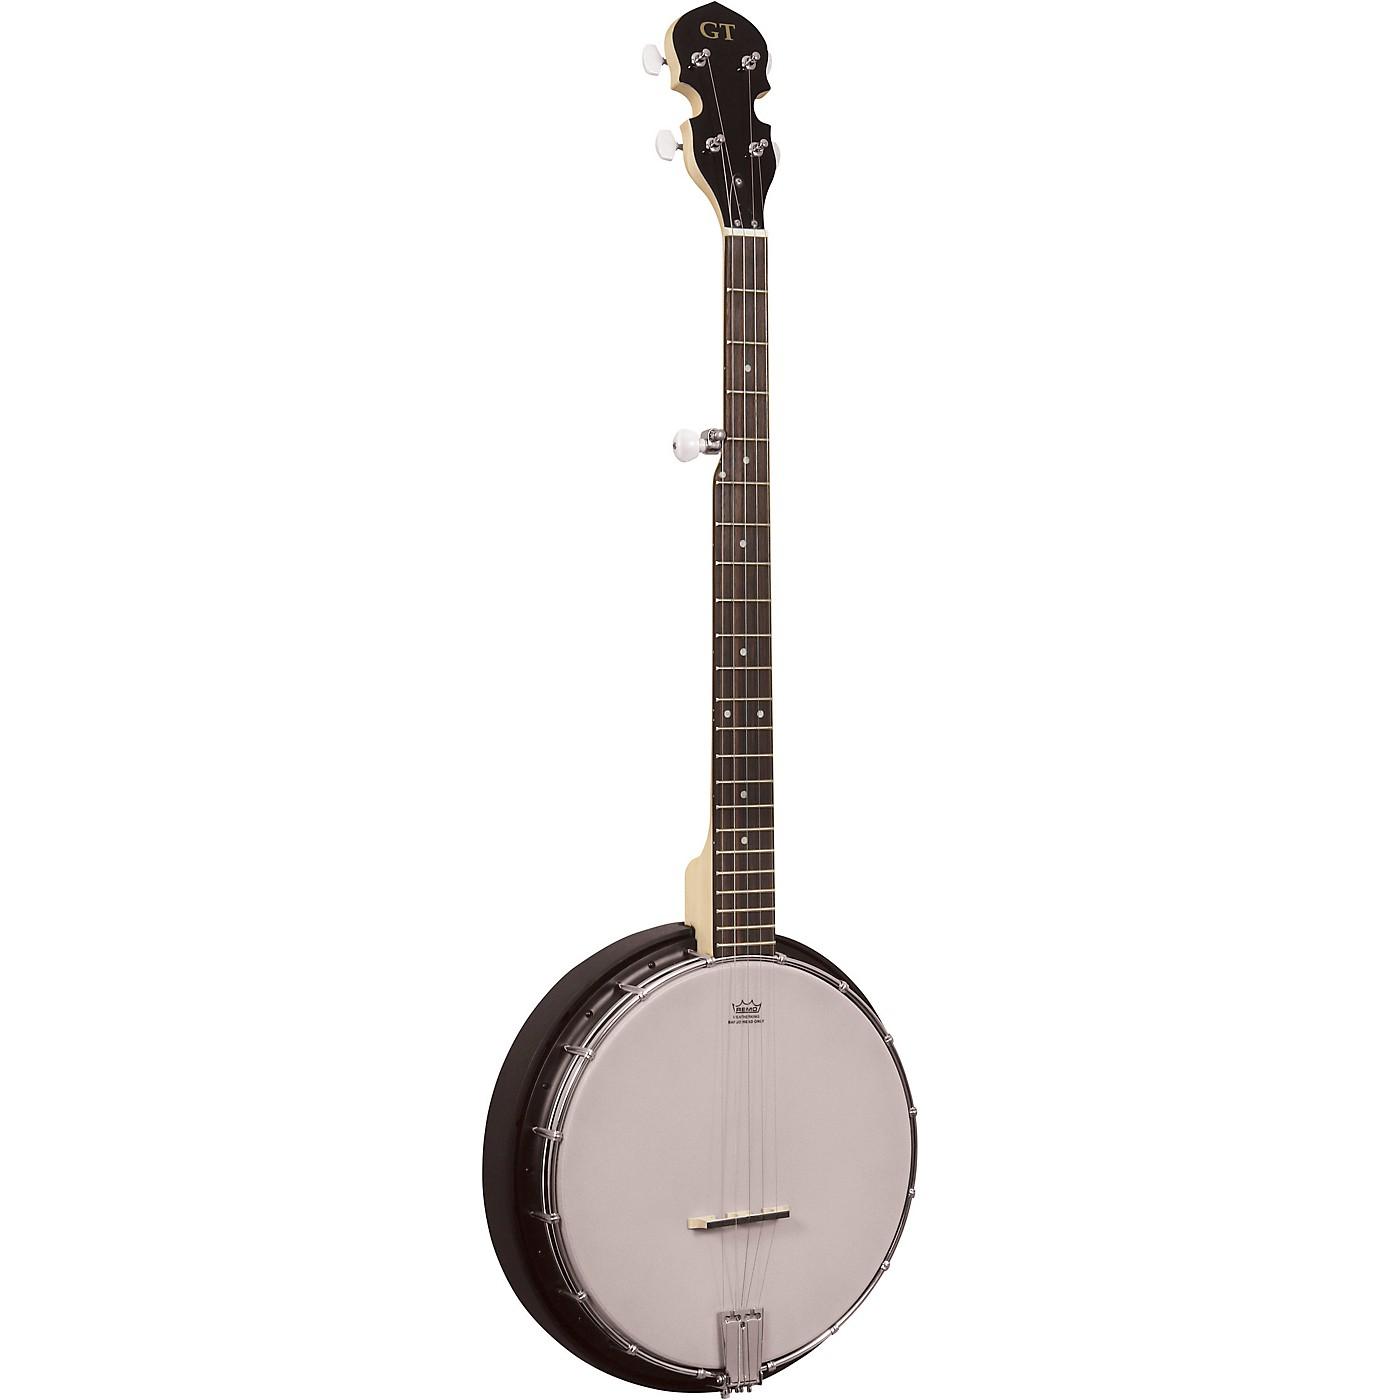 Gold Tone AC-5 Left-Handed Composite Resonator 5-String Banjo thumbnail